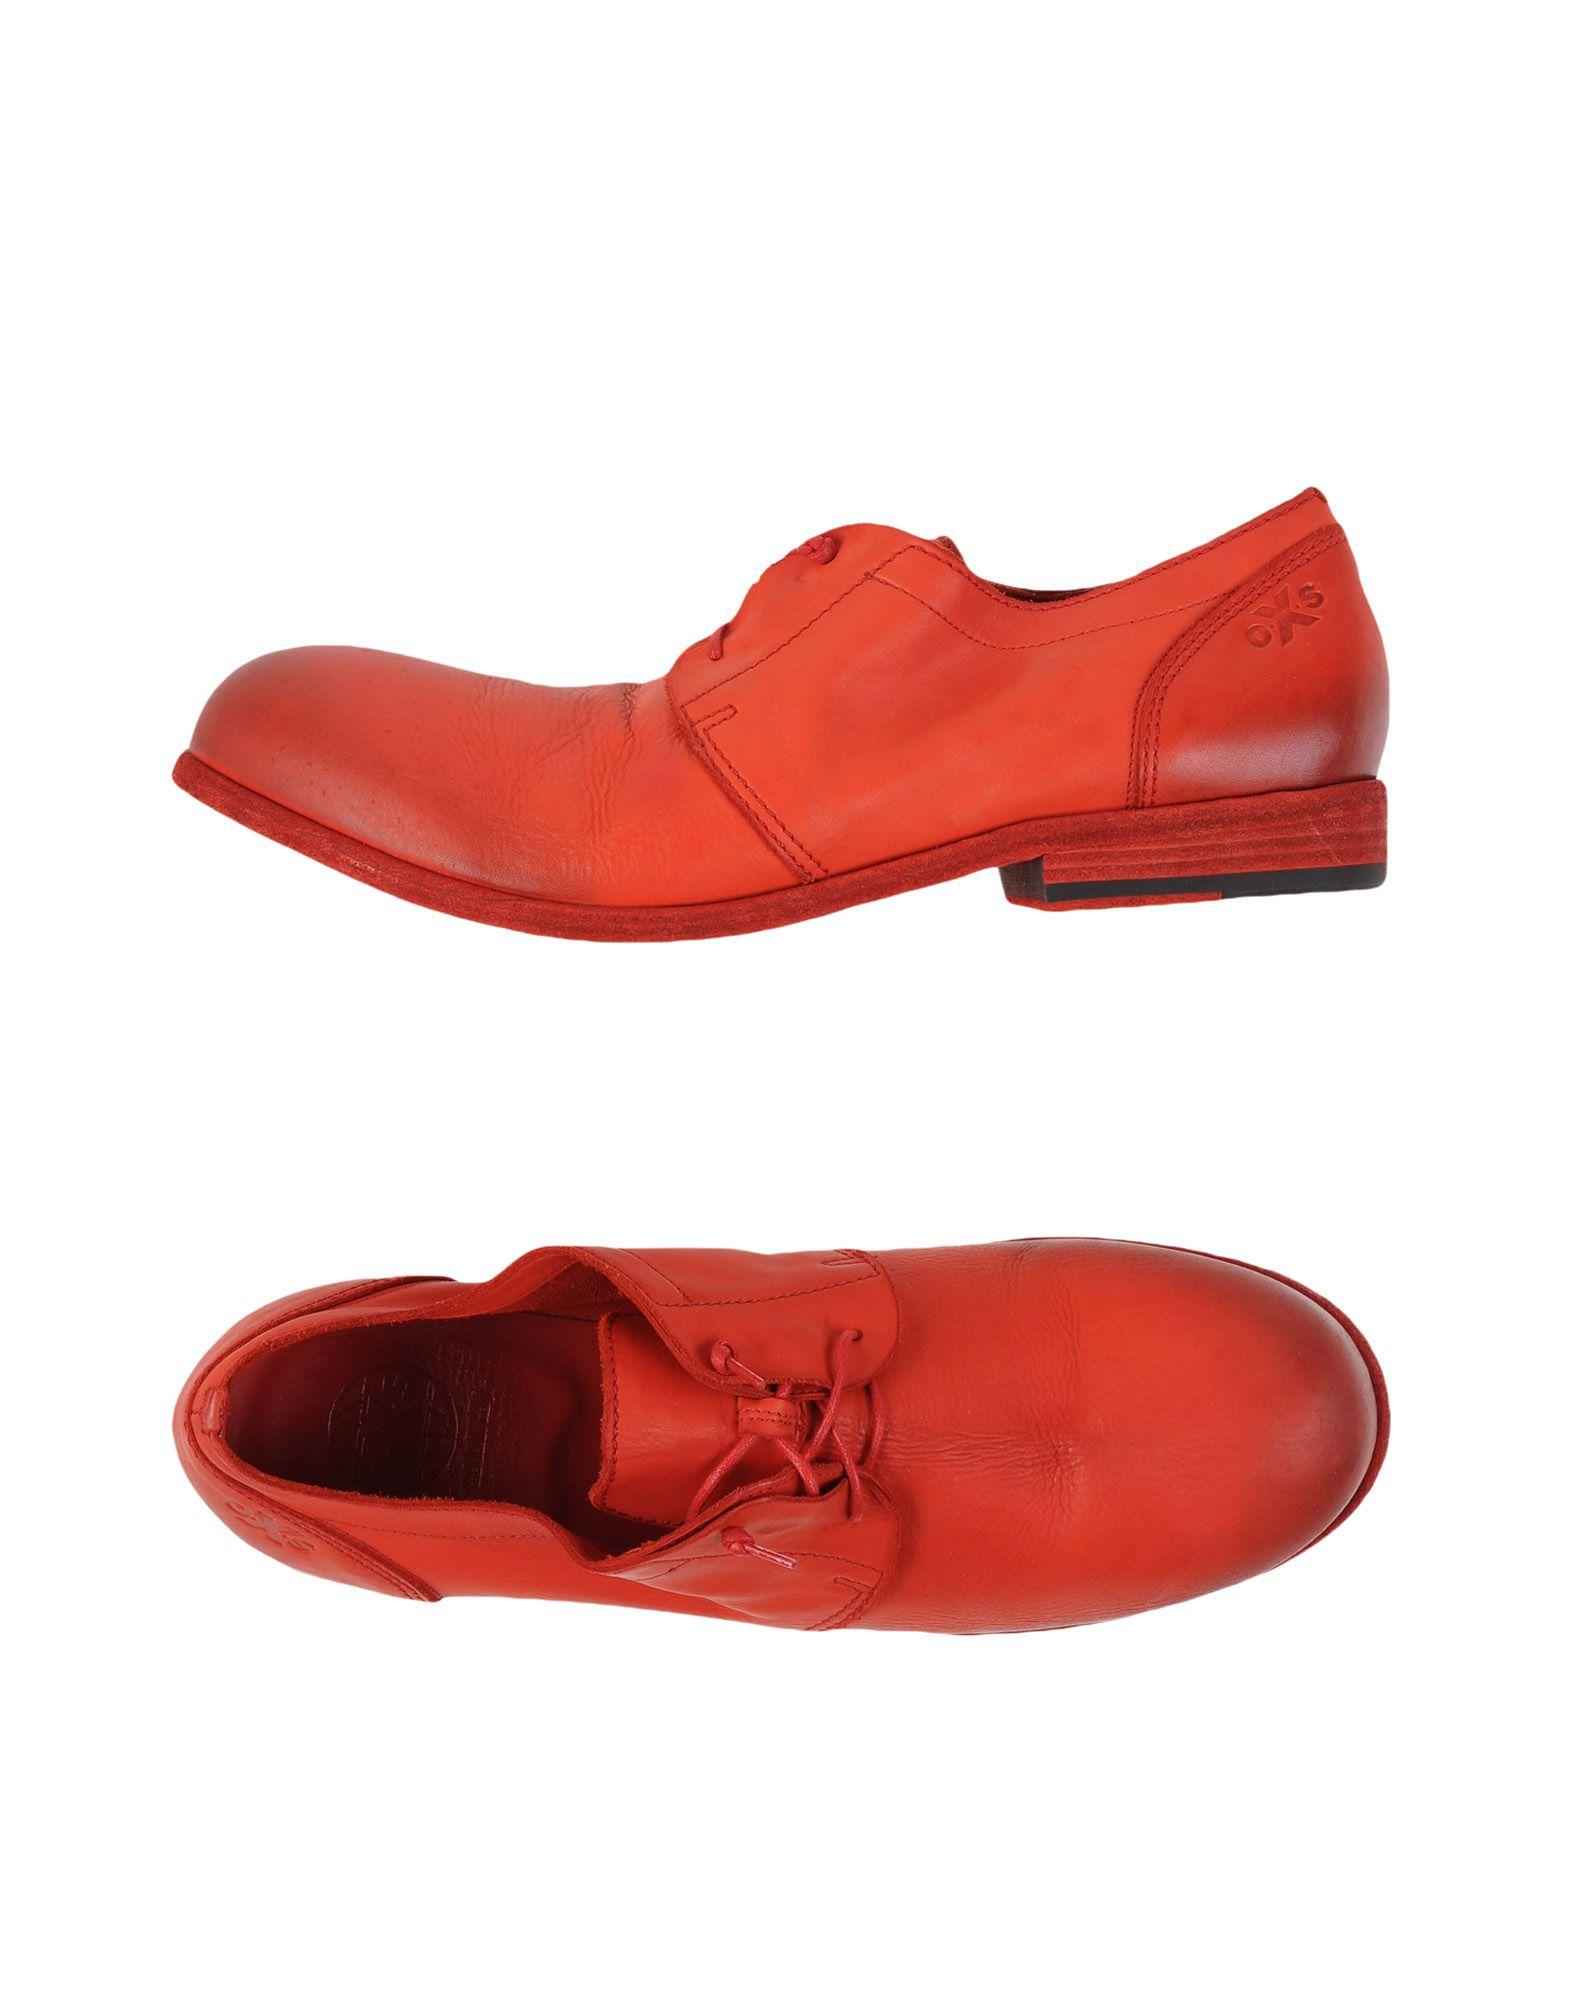 Фото - O.X.S. Обувь на шнурках обувь на высокой платформе dkny